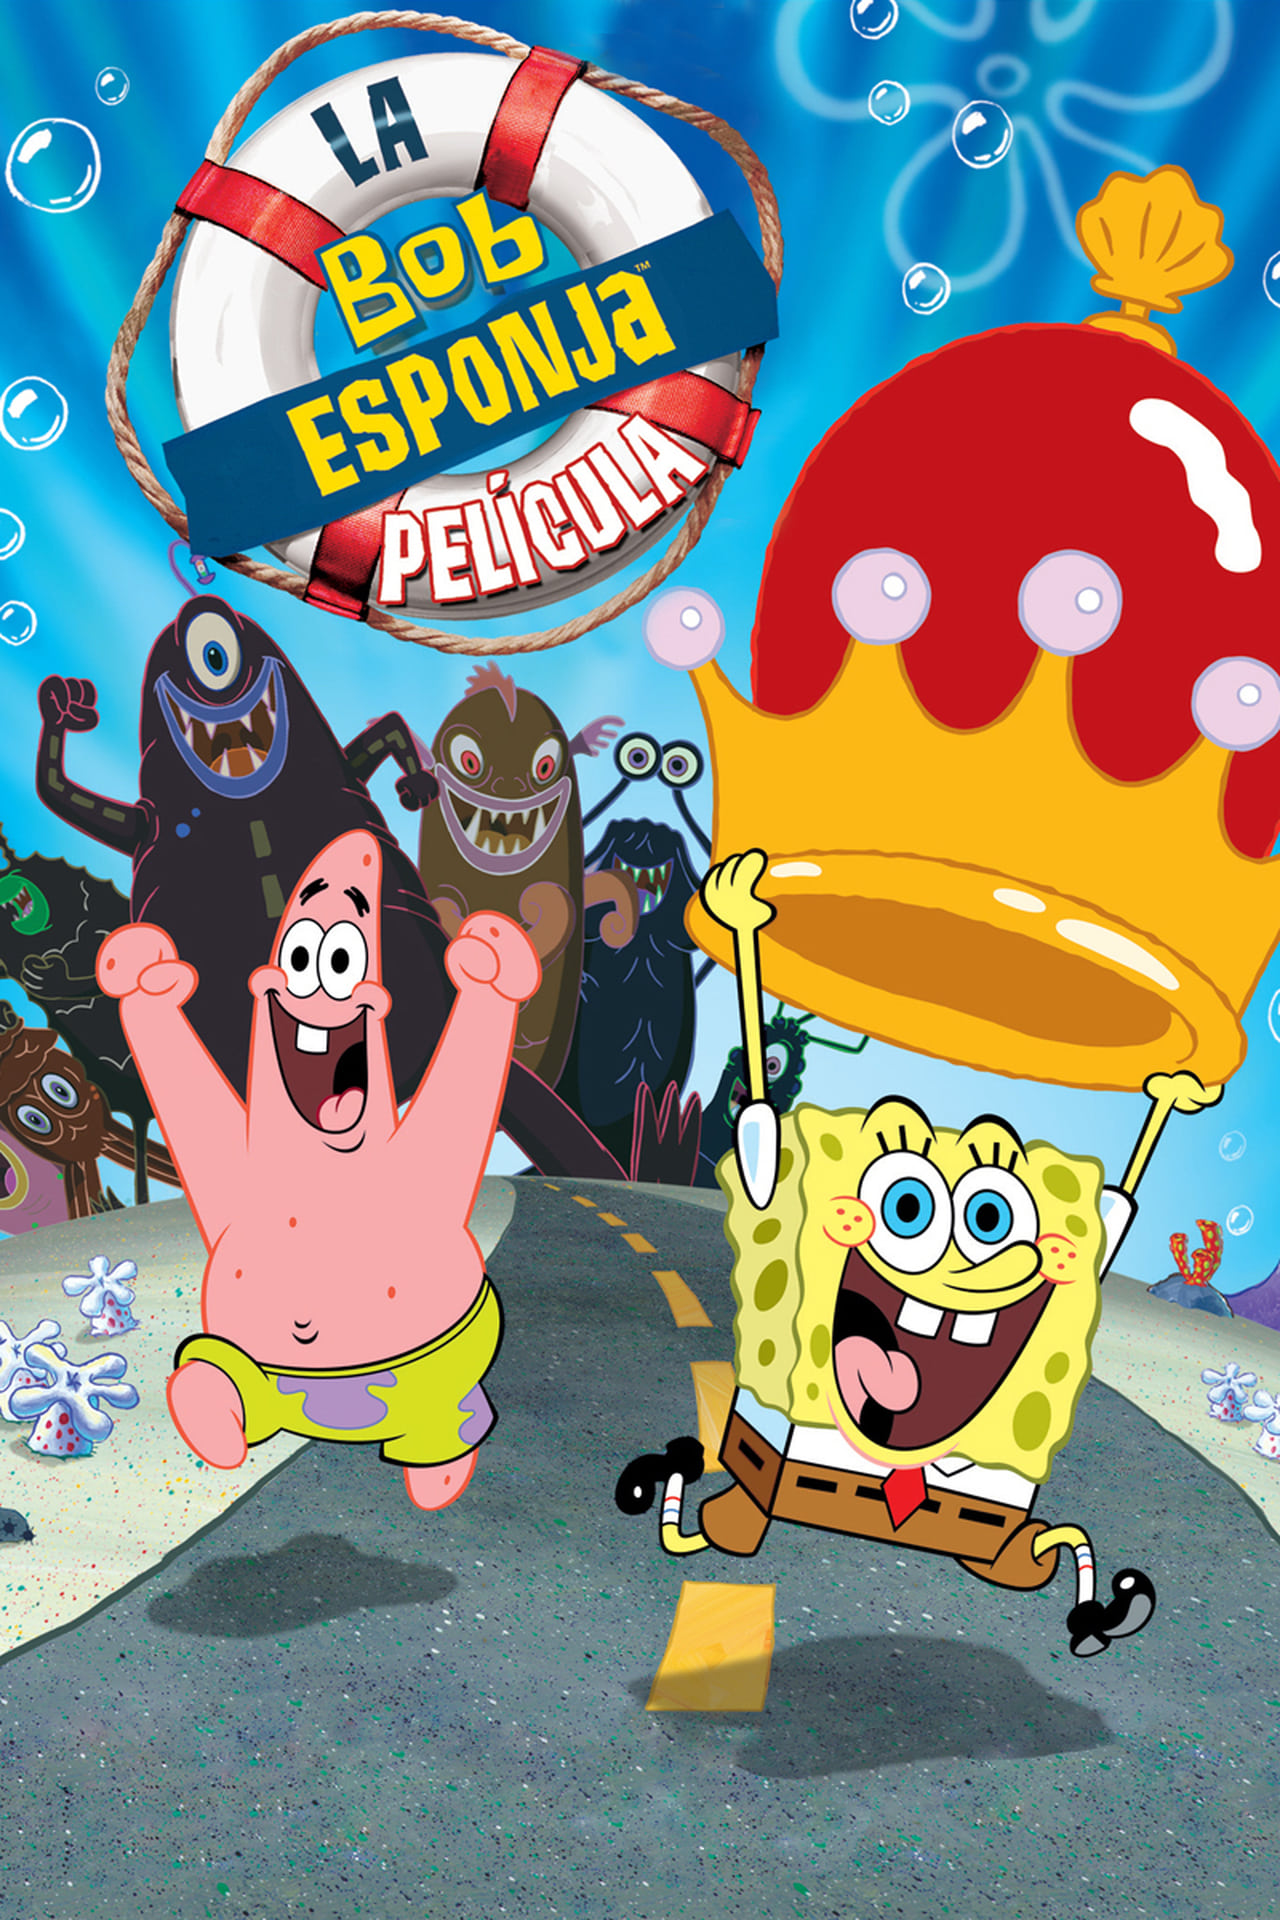 the spongebob squarepants movie 2004 download